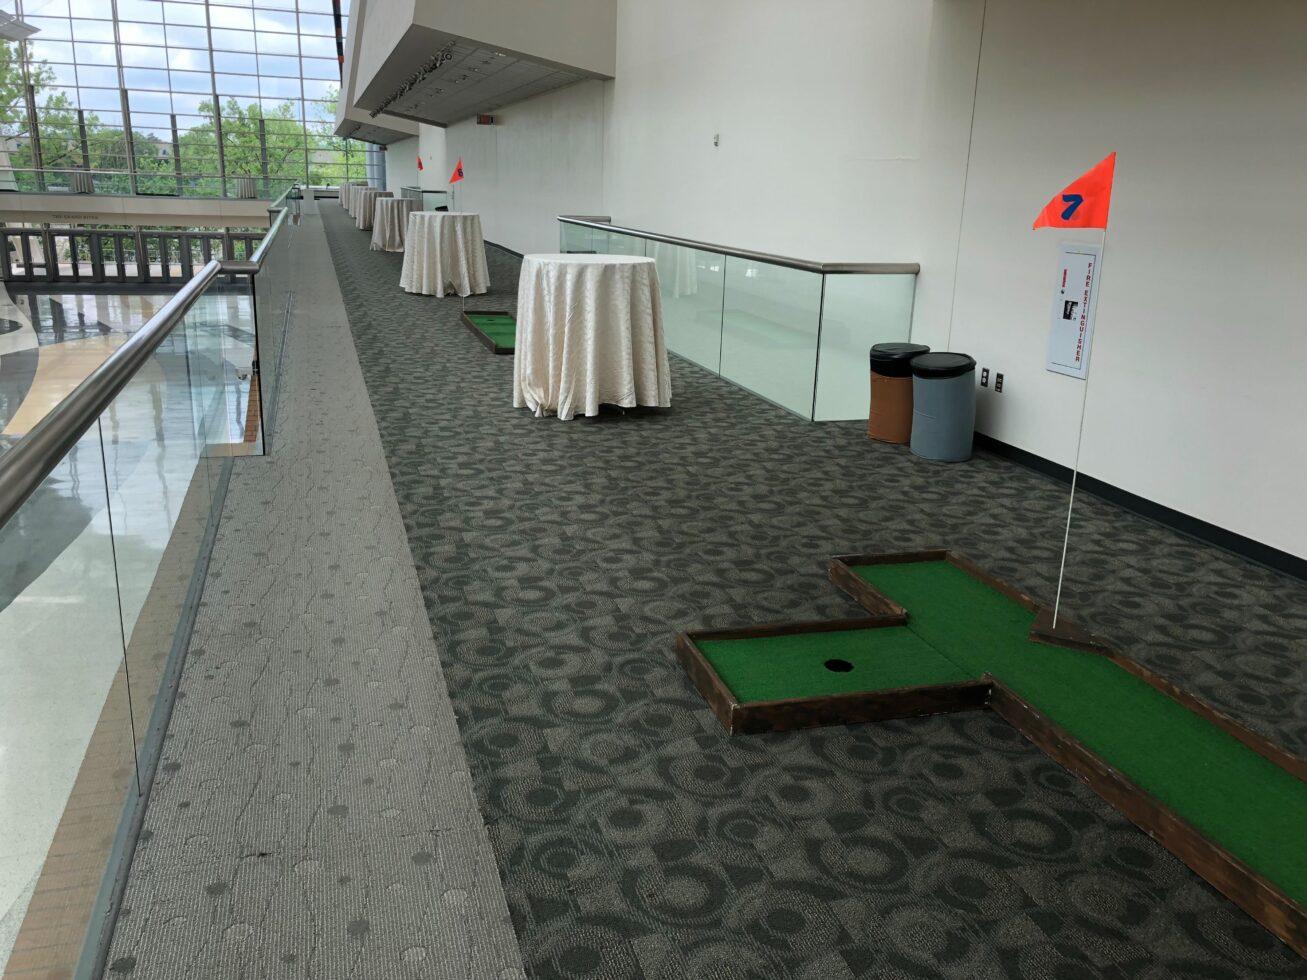 Wooden mini golf course